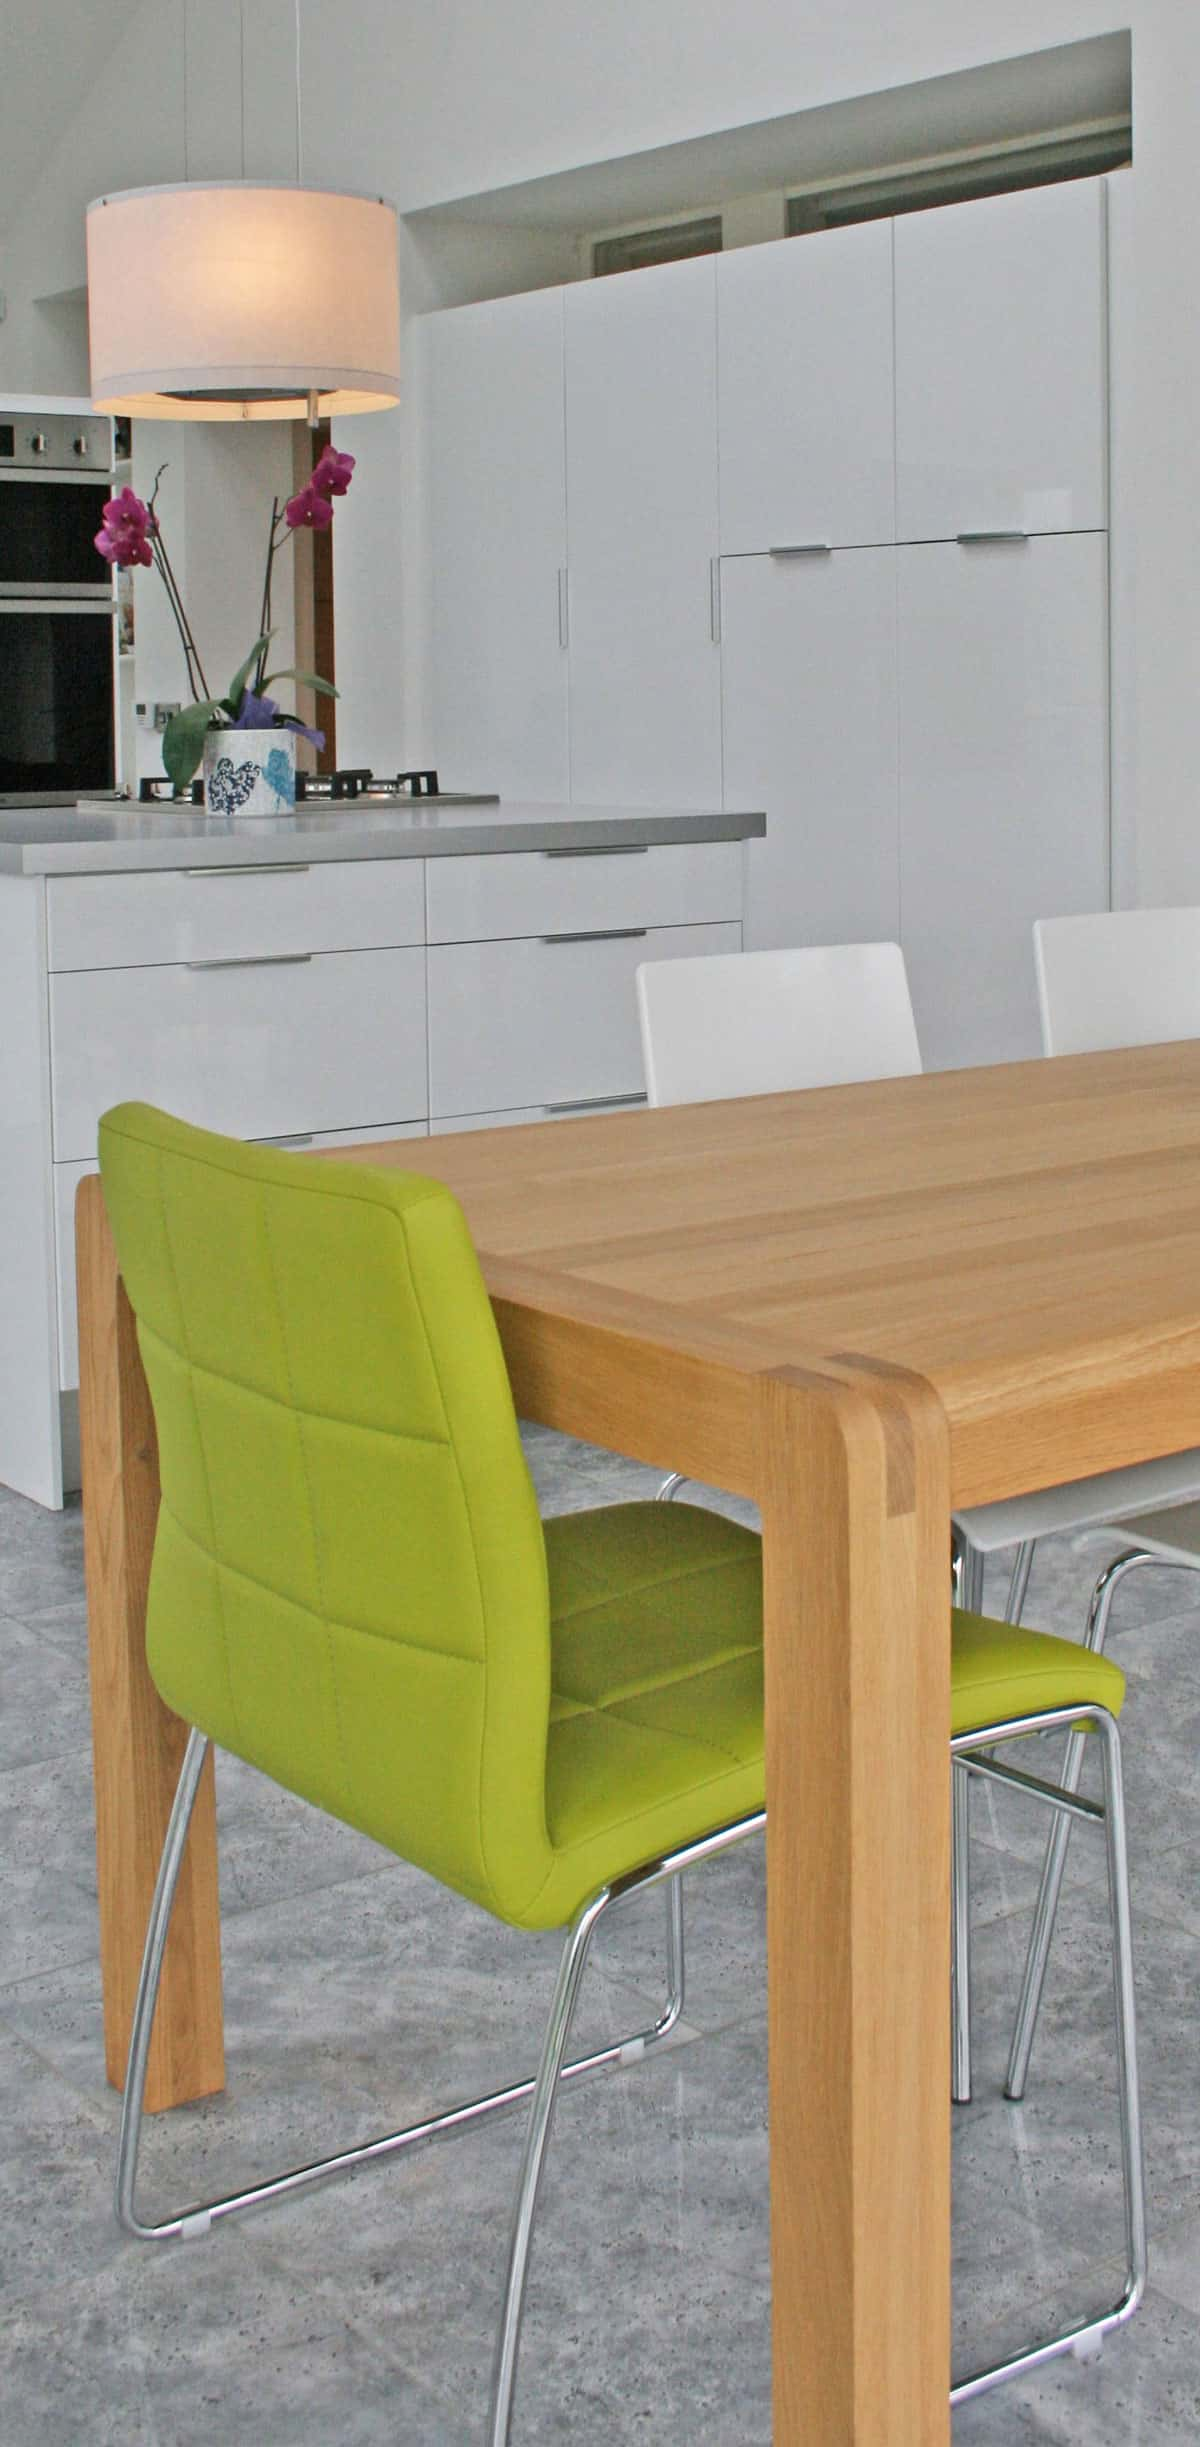 Nagi Dwelling -Internal Built in Kitchen Units